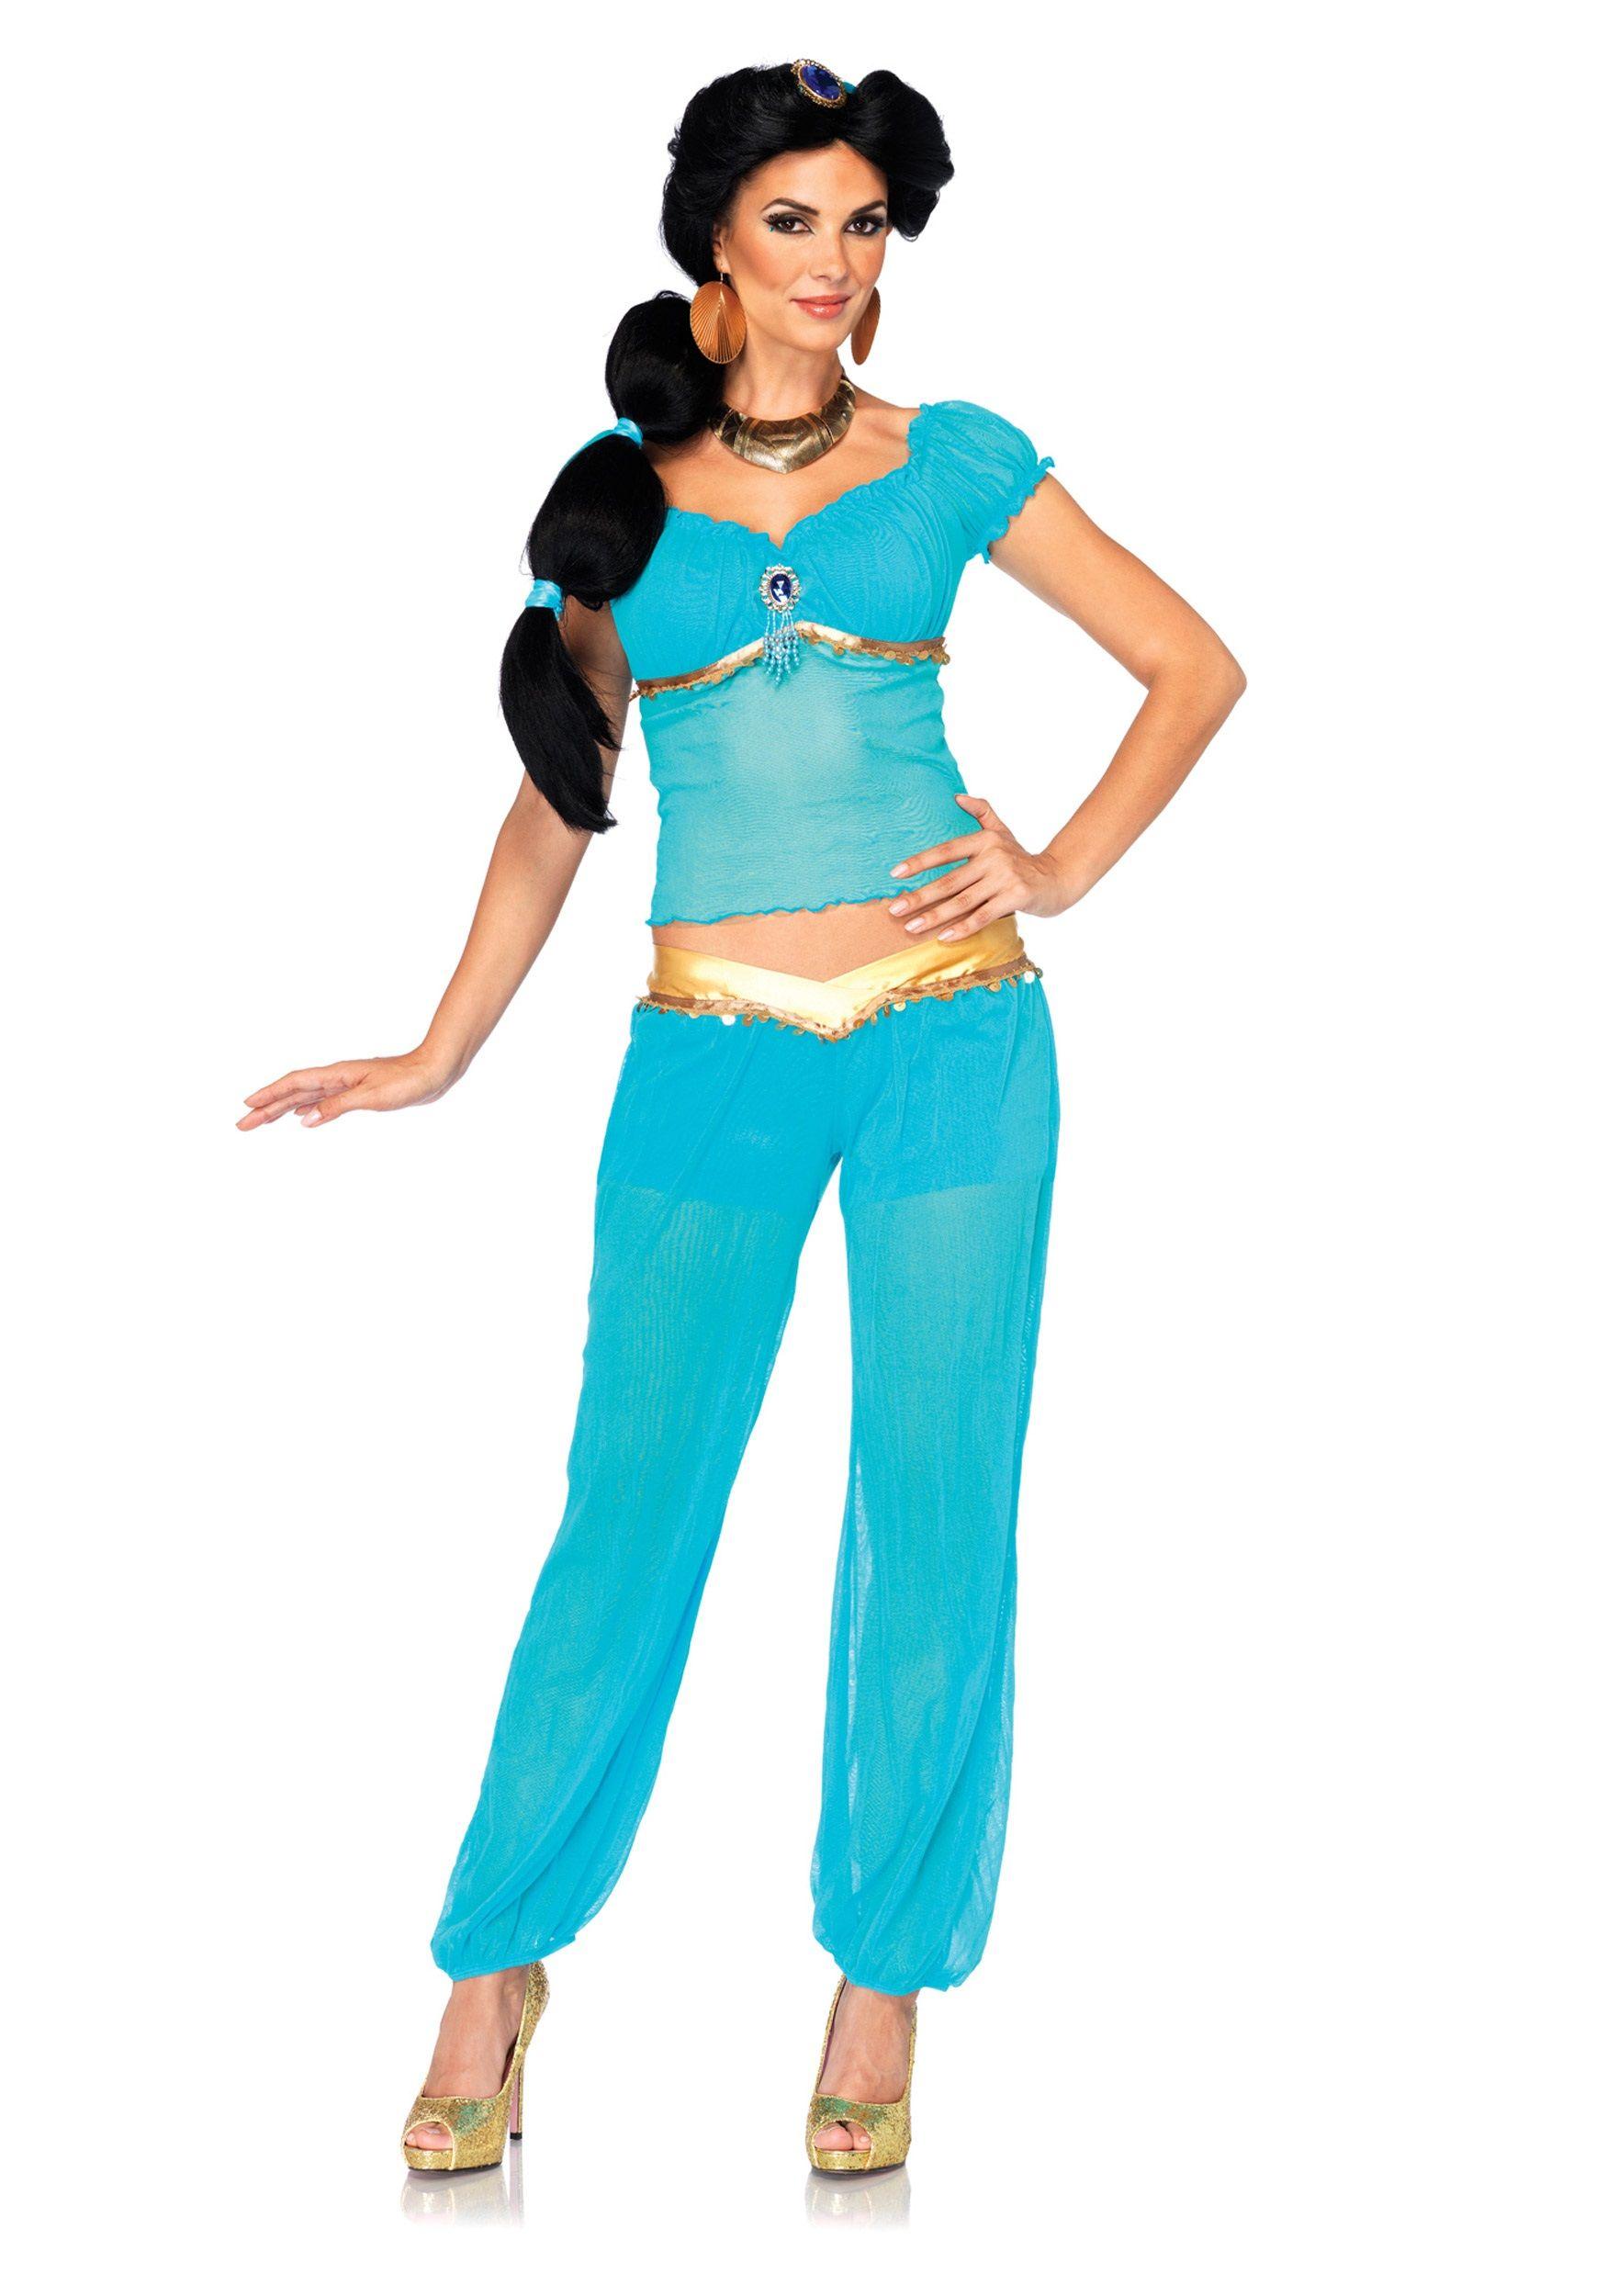 63b87193f4cfb3 Womens Disney Jasmine Costume in 2019 | Disney | Jasmine costume ...